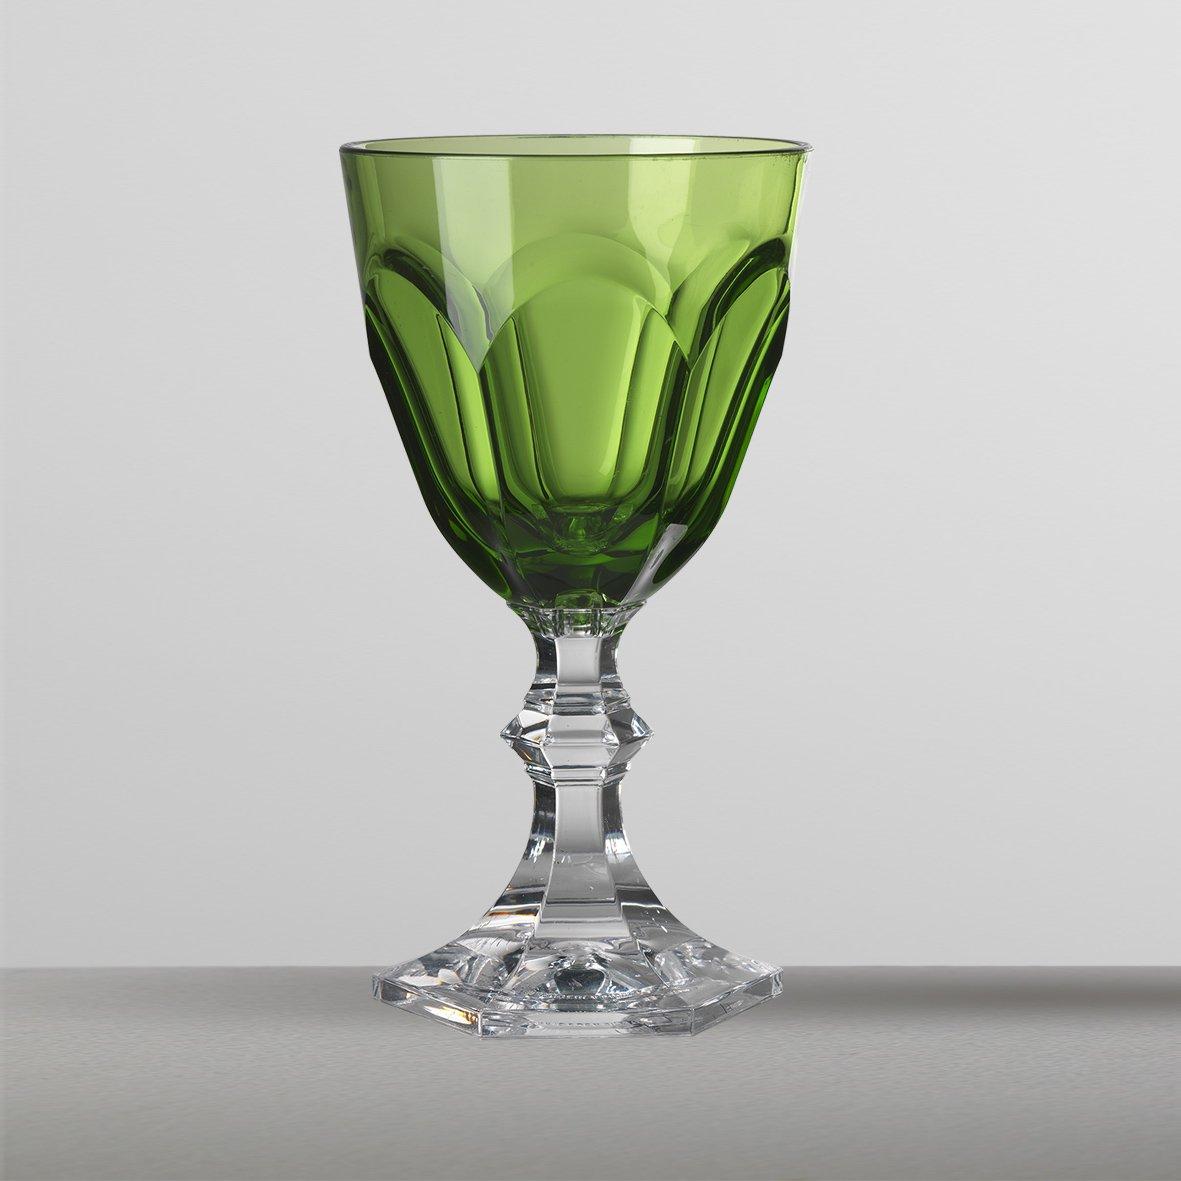 Mario Luca Giusti Set 6 Dolce Vita Water Glass Green by Mario Luca Giusti